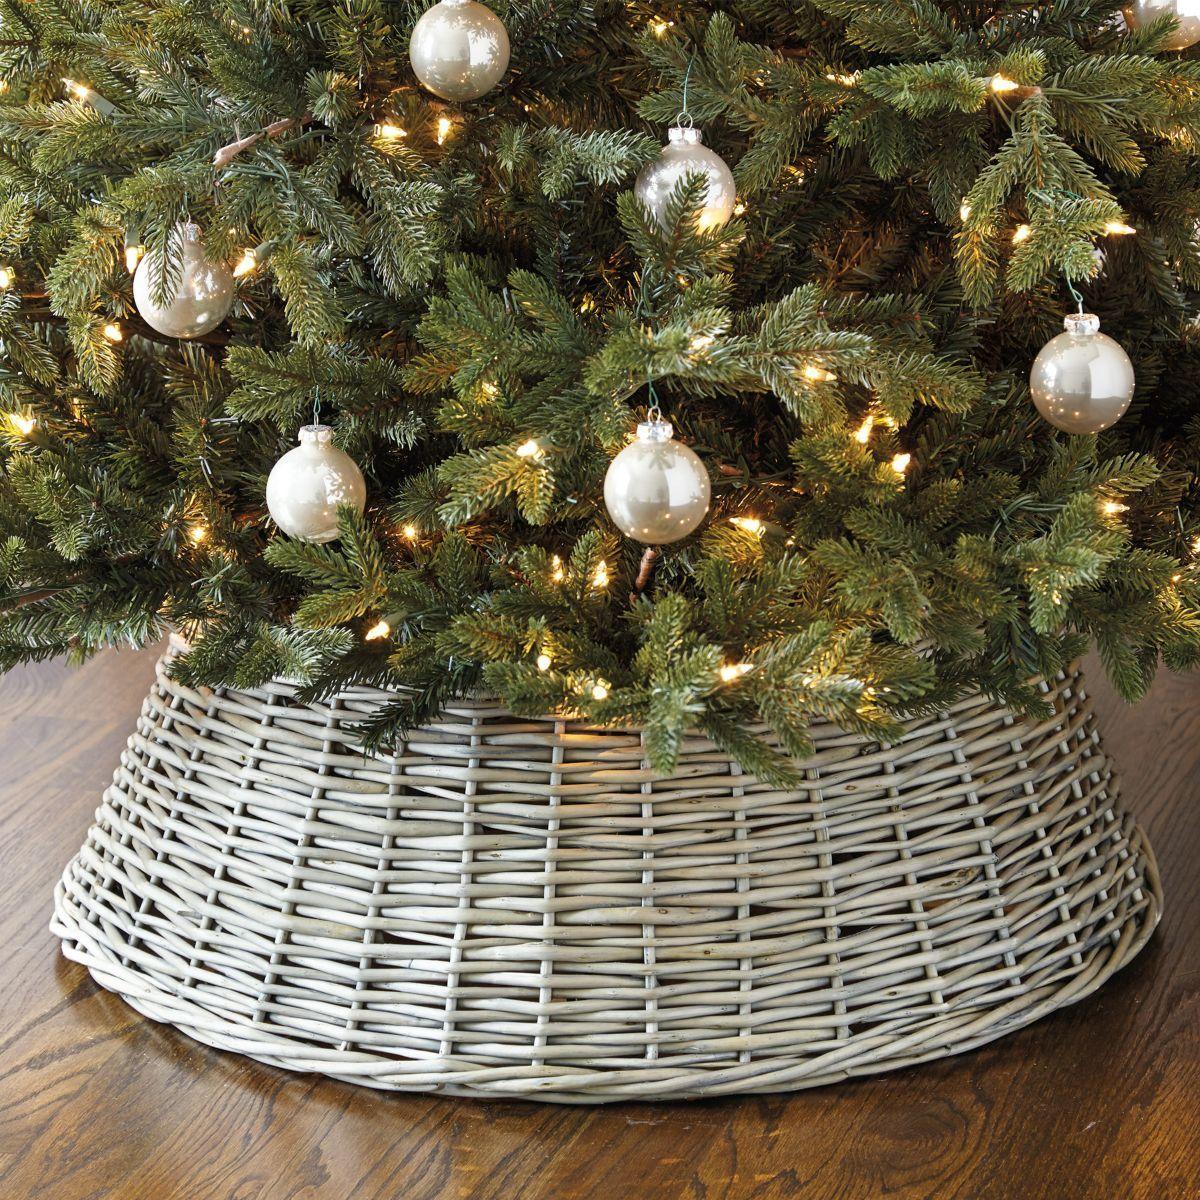 Willow Christmas Tree Basket Christmas tree in basket